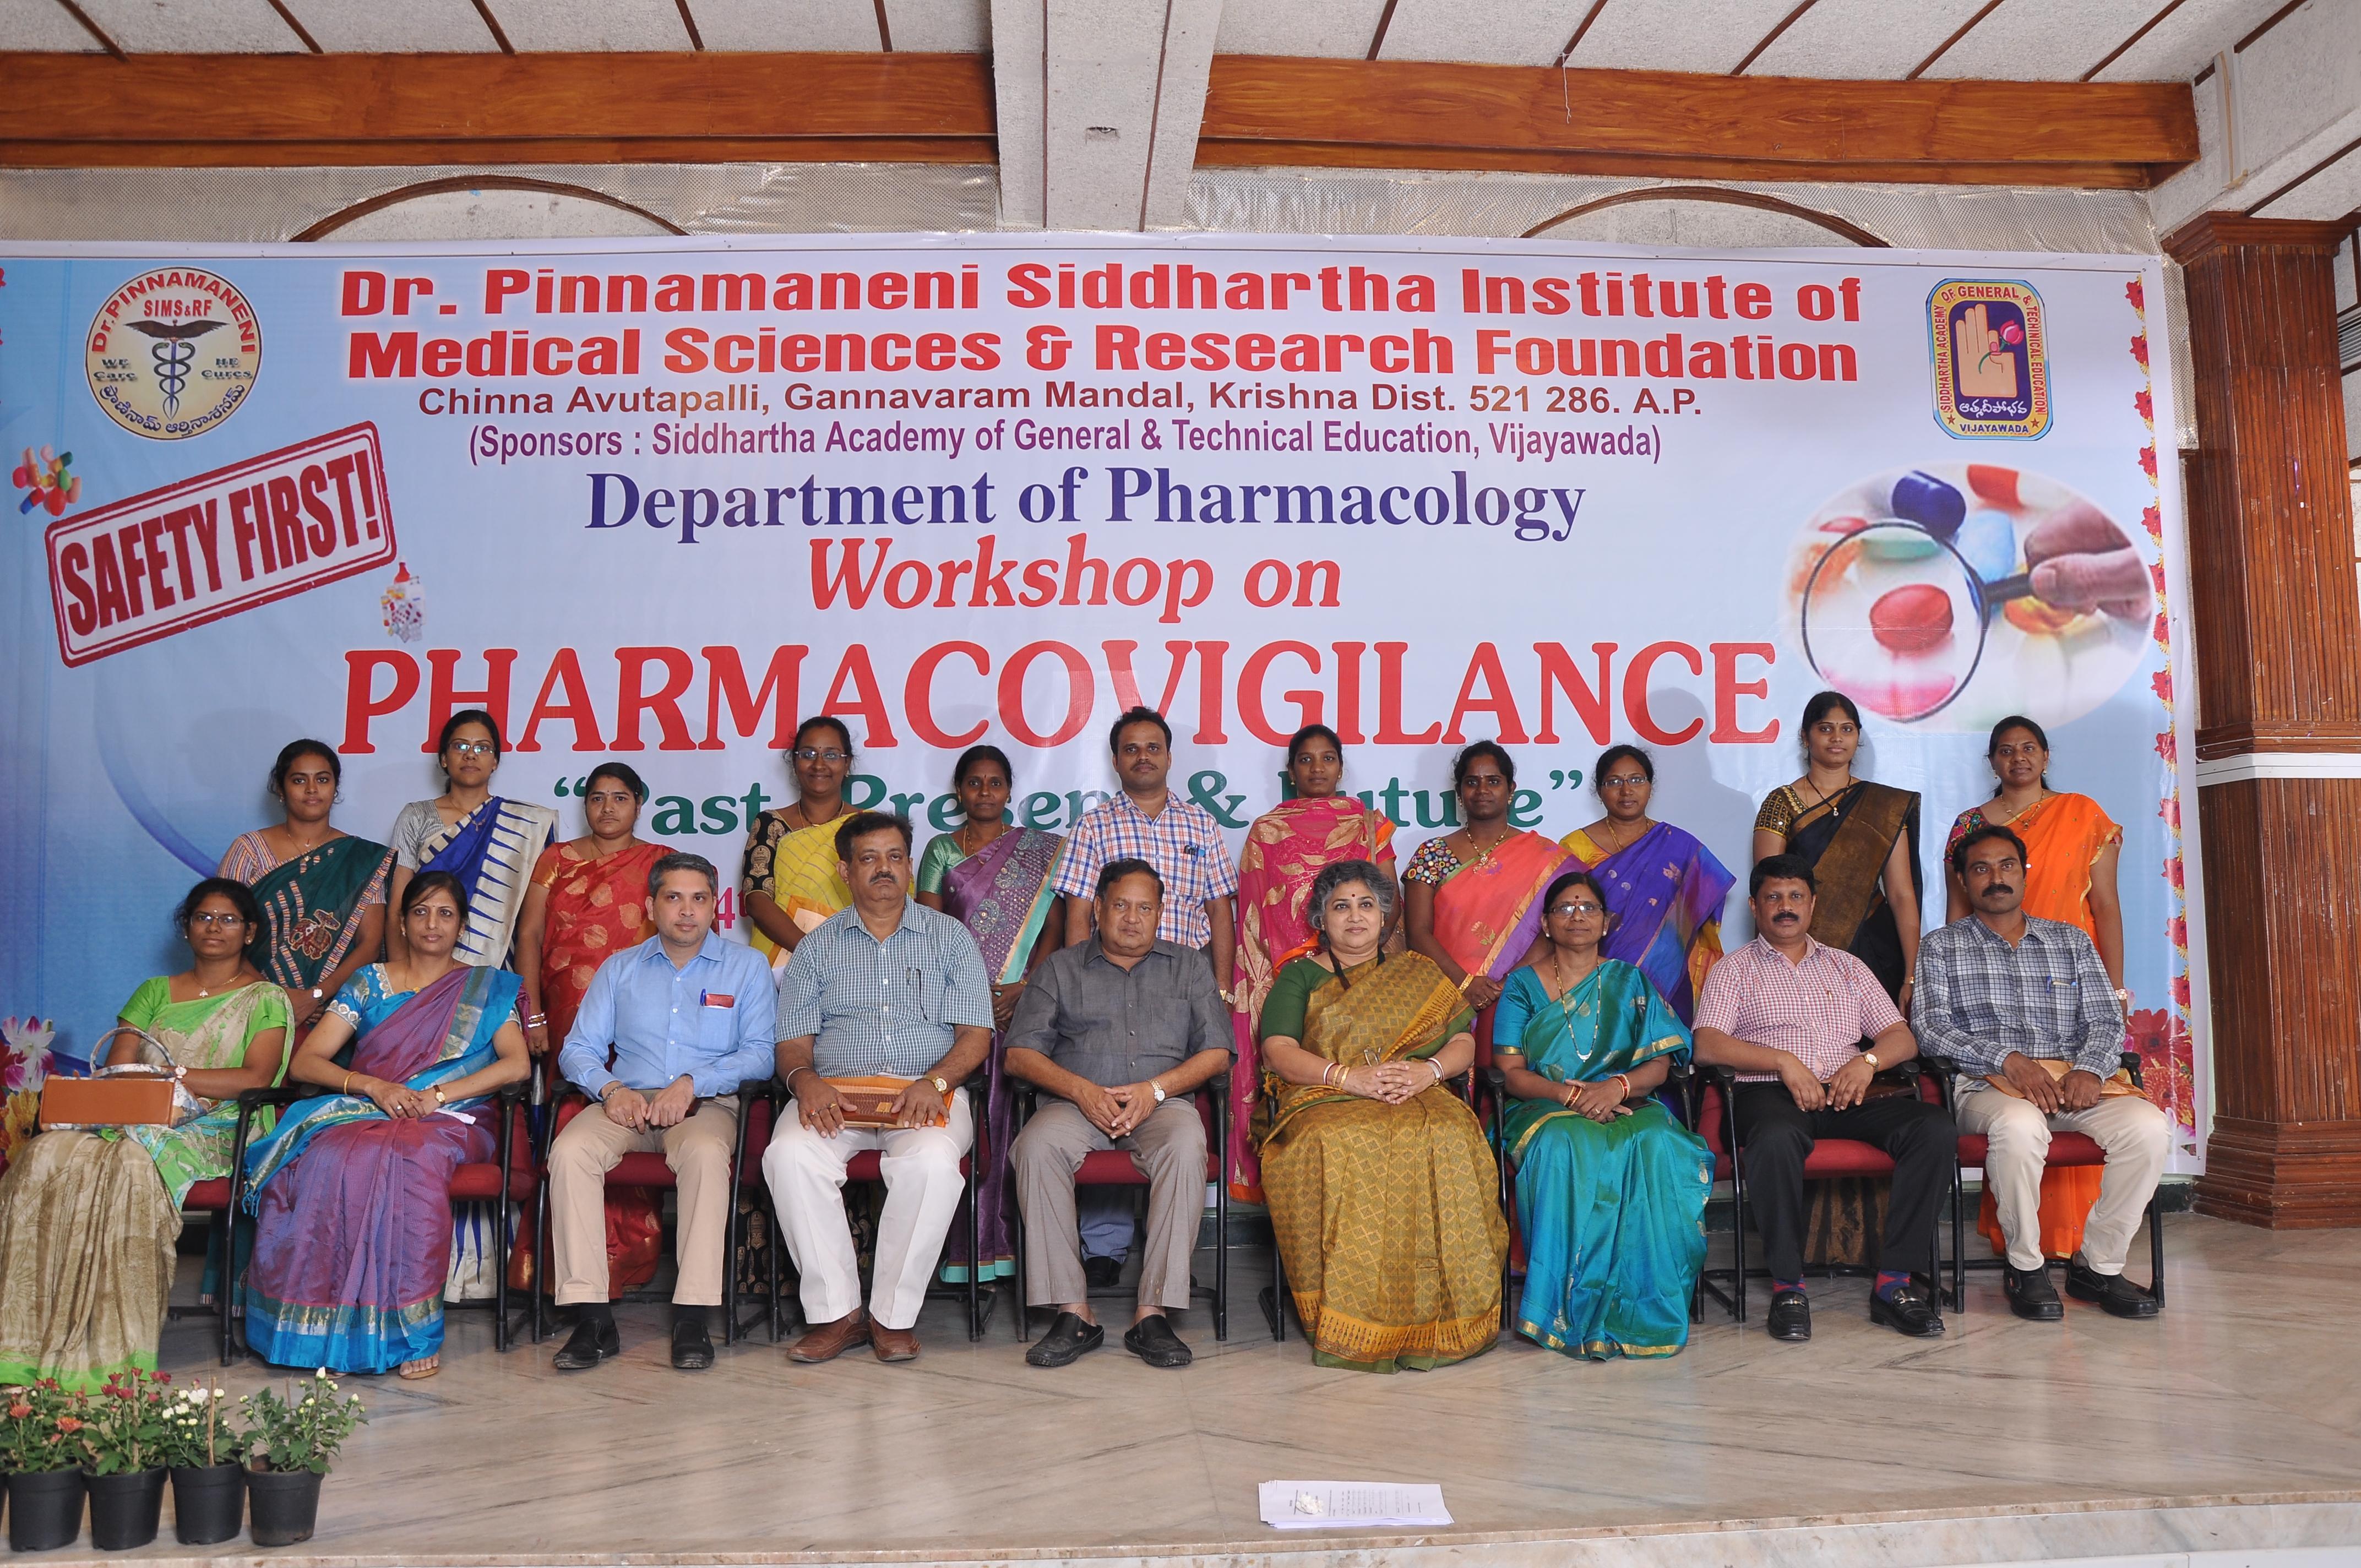 "Workshop on PHARMACOVIGILANCE ""Past,Present & Future"""